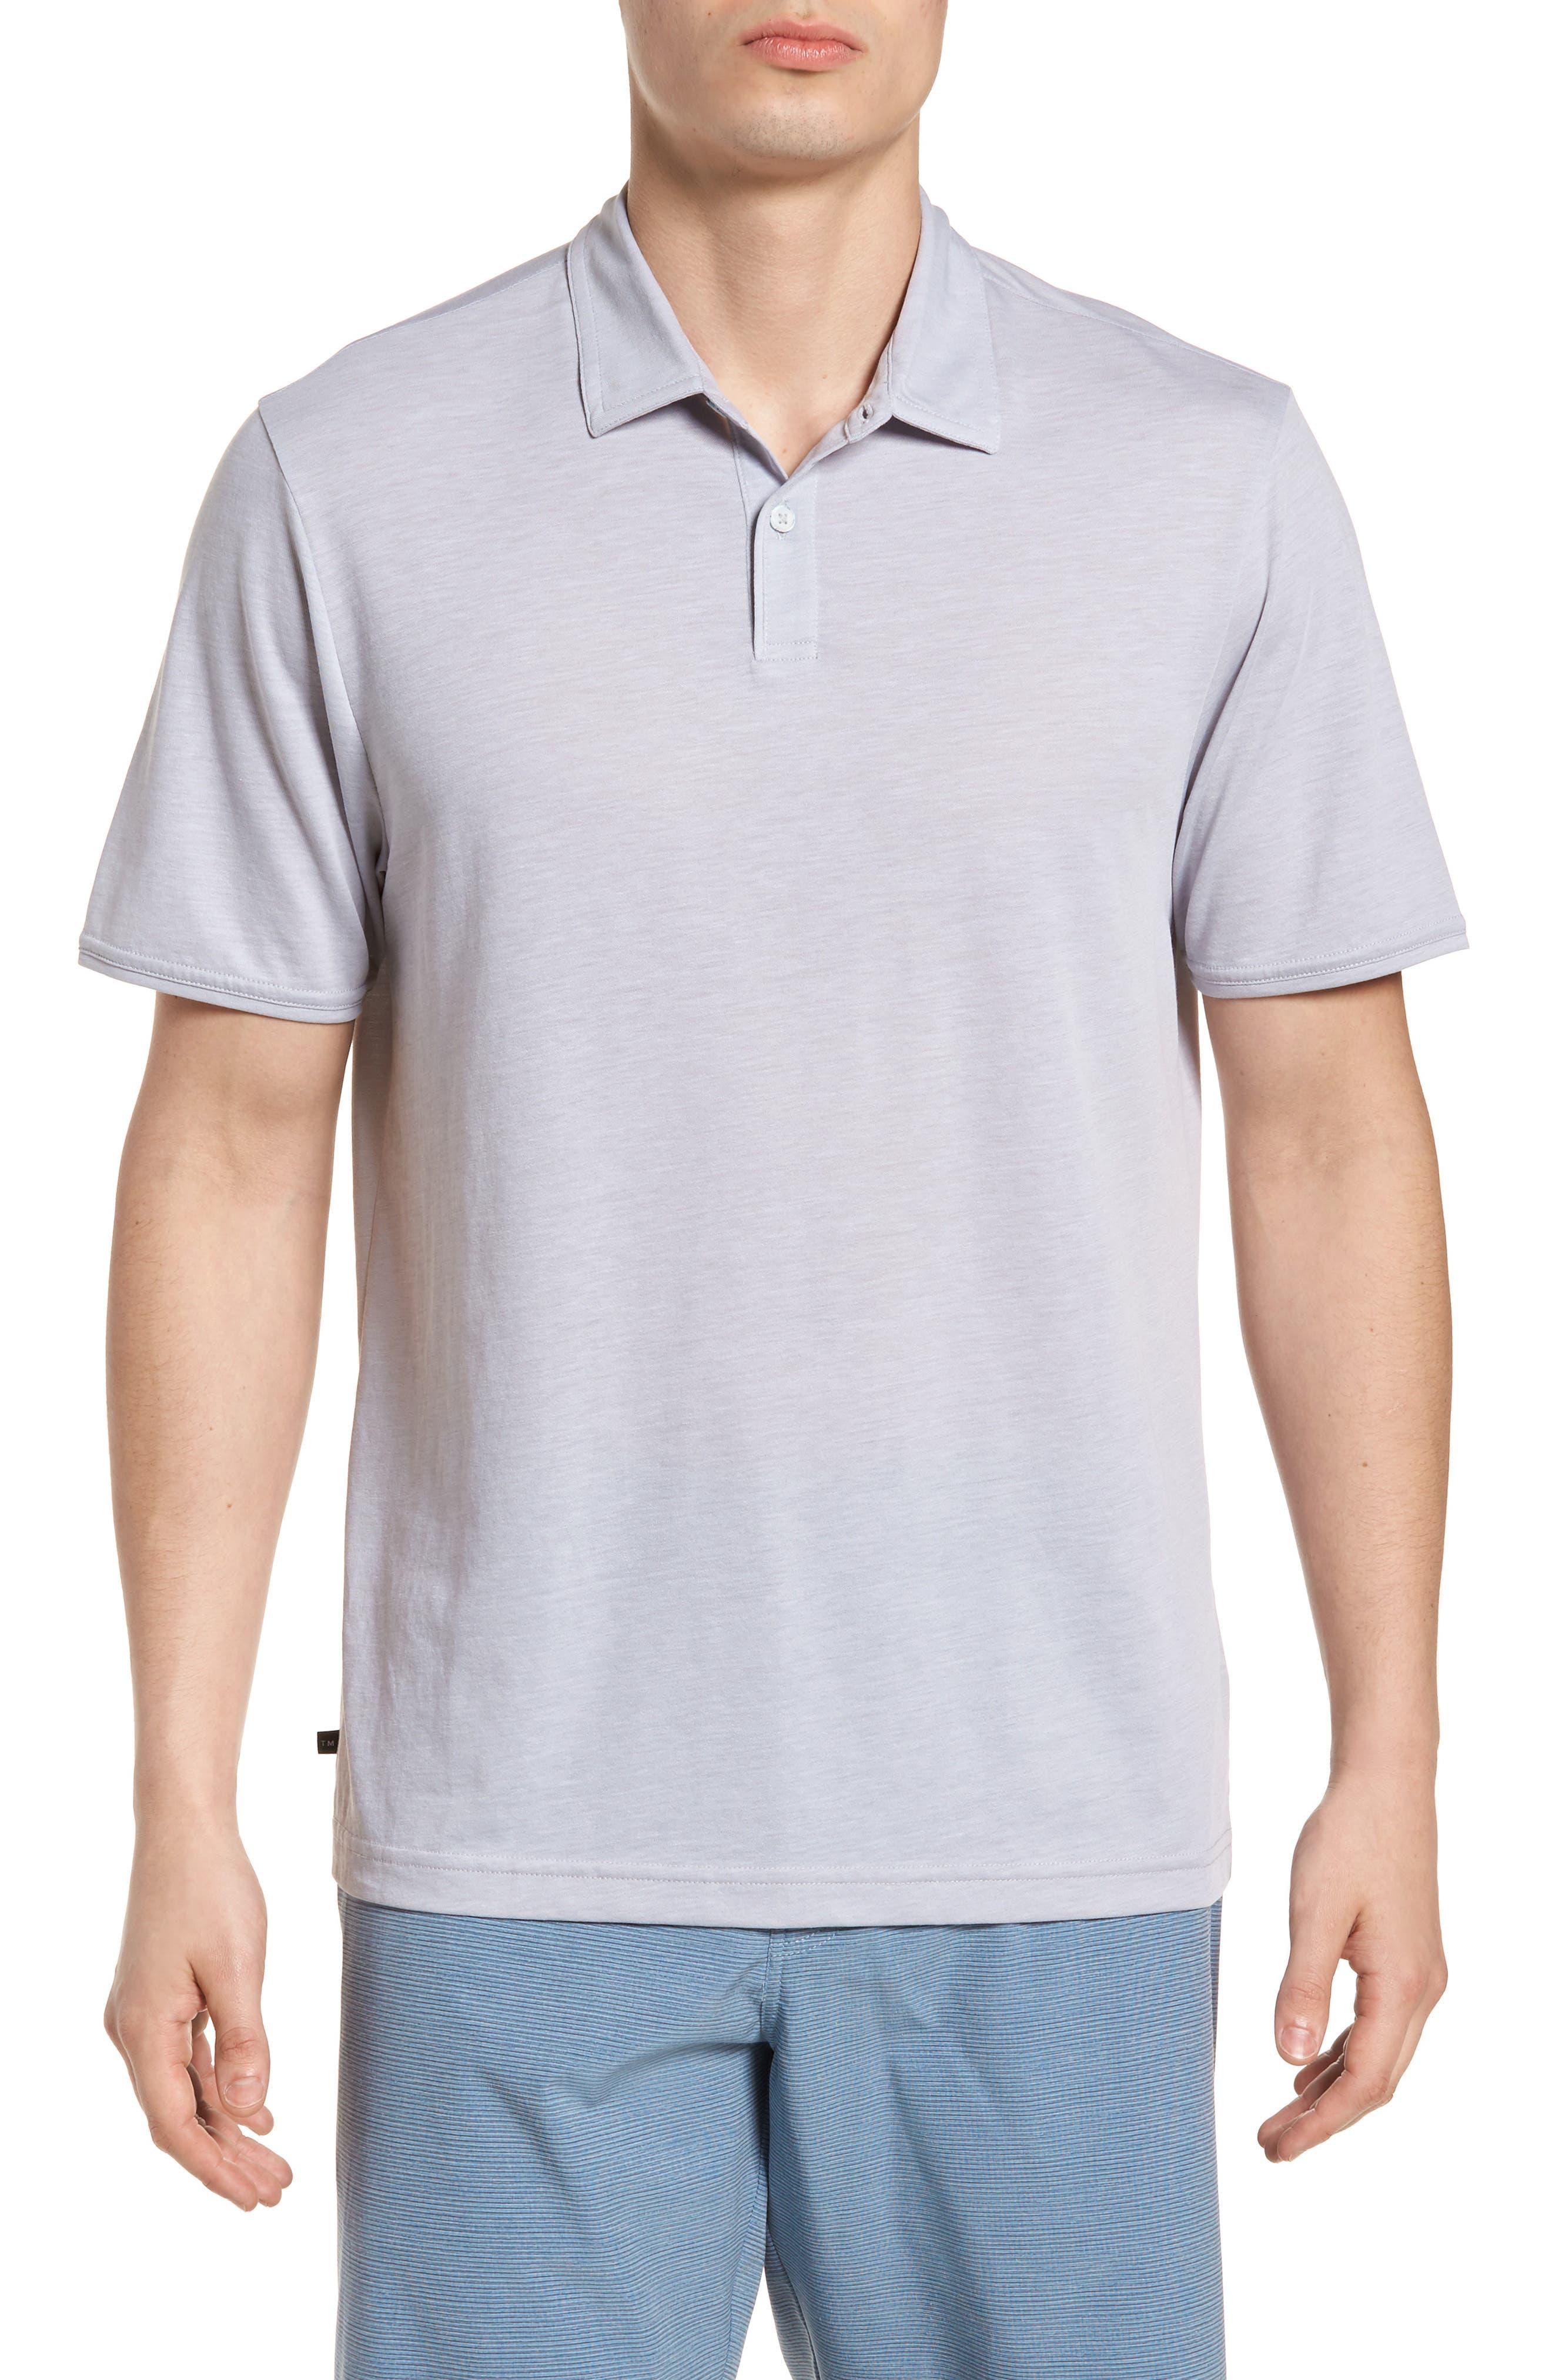 Alternate Image 1 Selected - Travis Mathew Shalene Regular Fit Polo